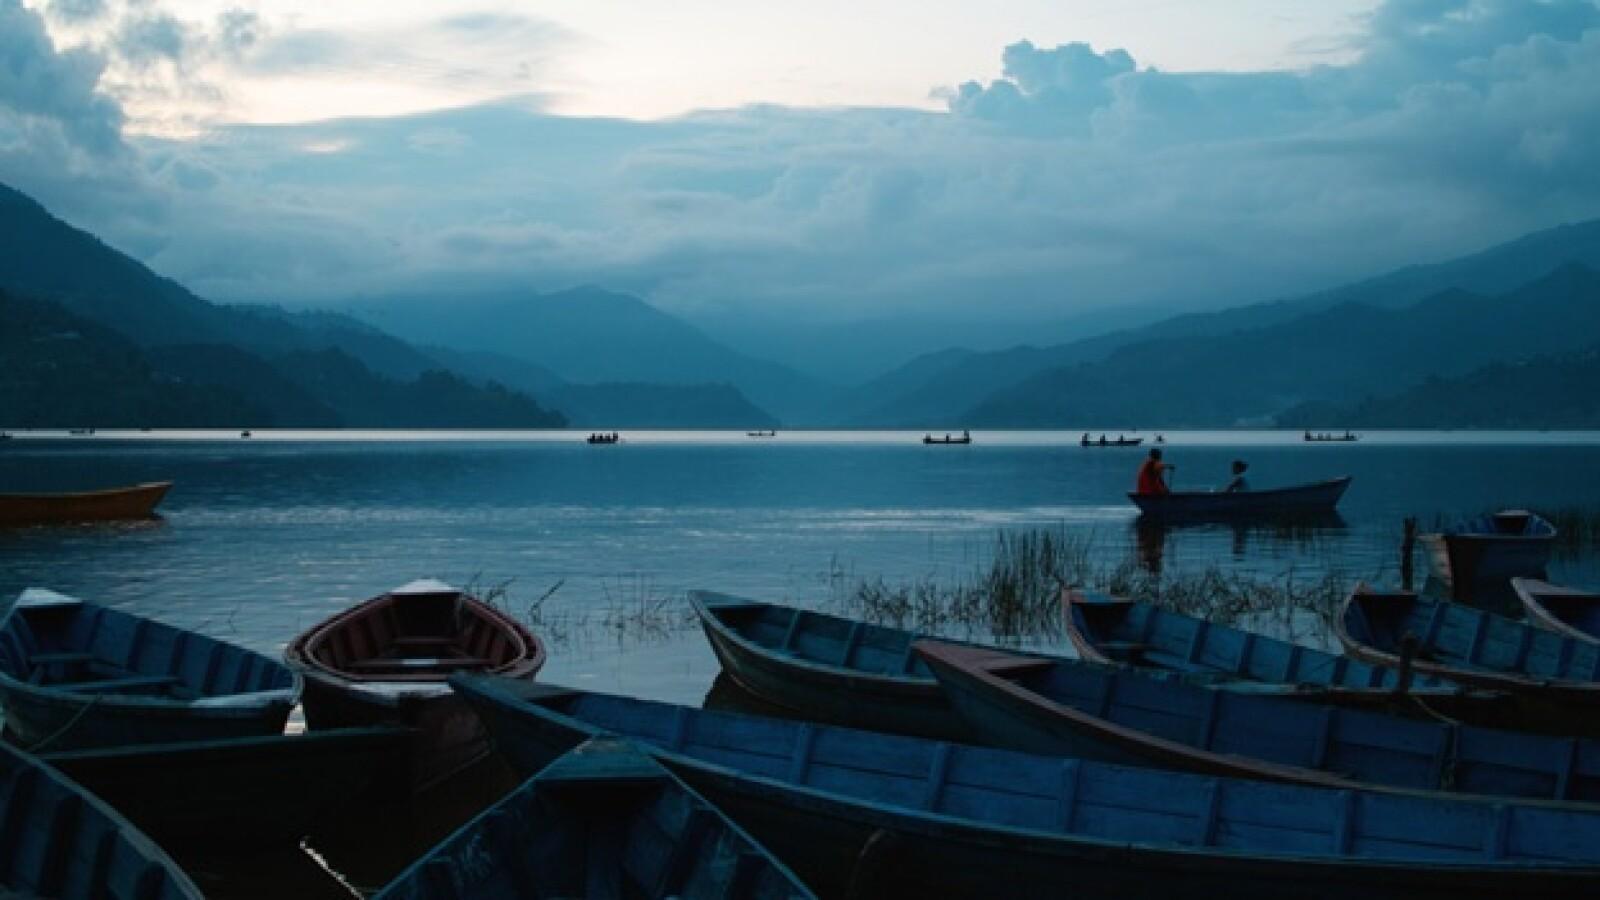 nepal Julie Mayfeng fotógrafa de viajes monocle, fotografia, viaje, foto